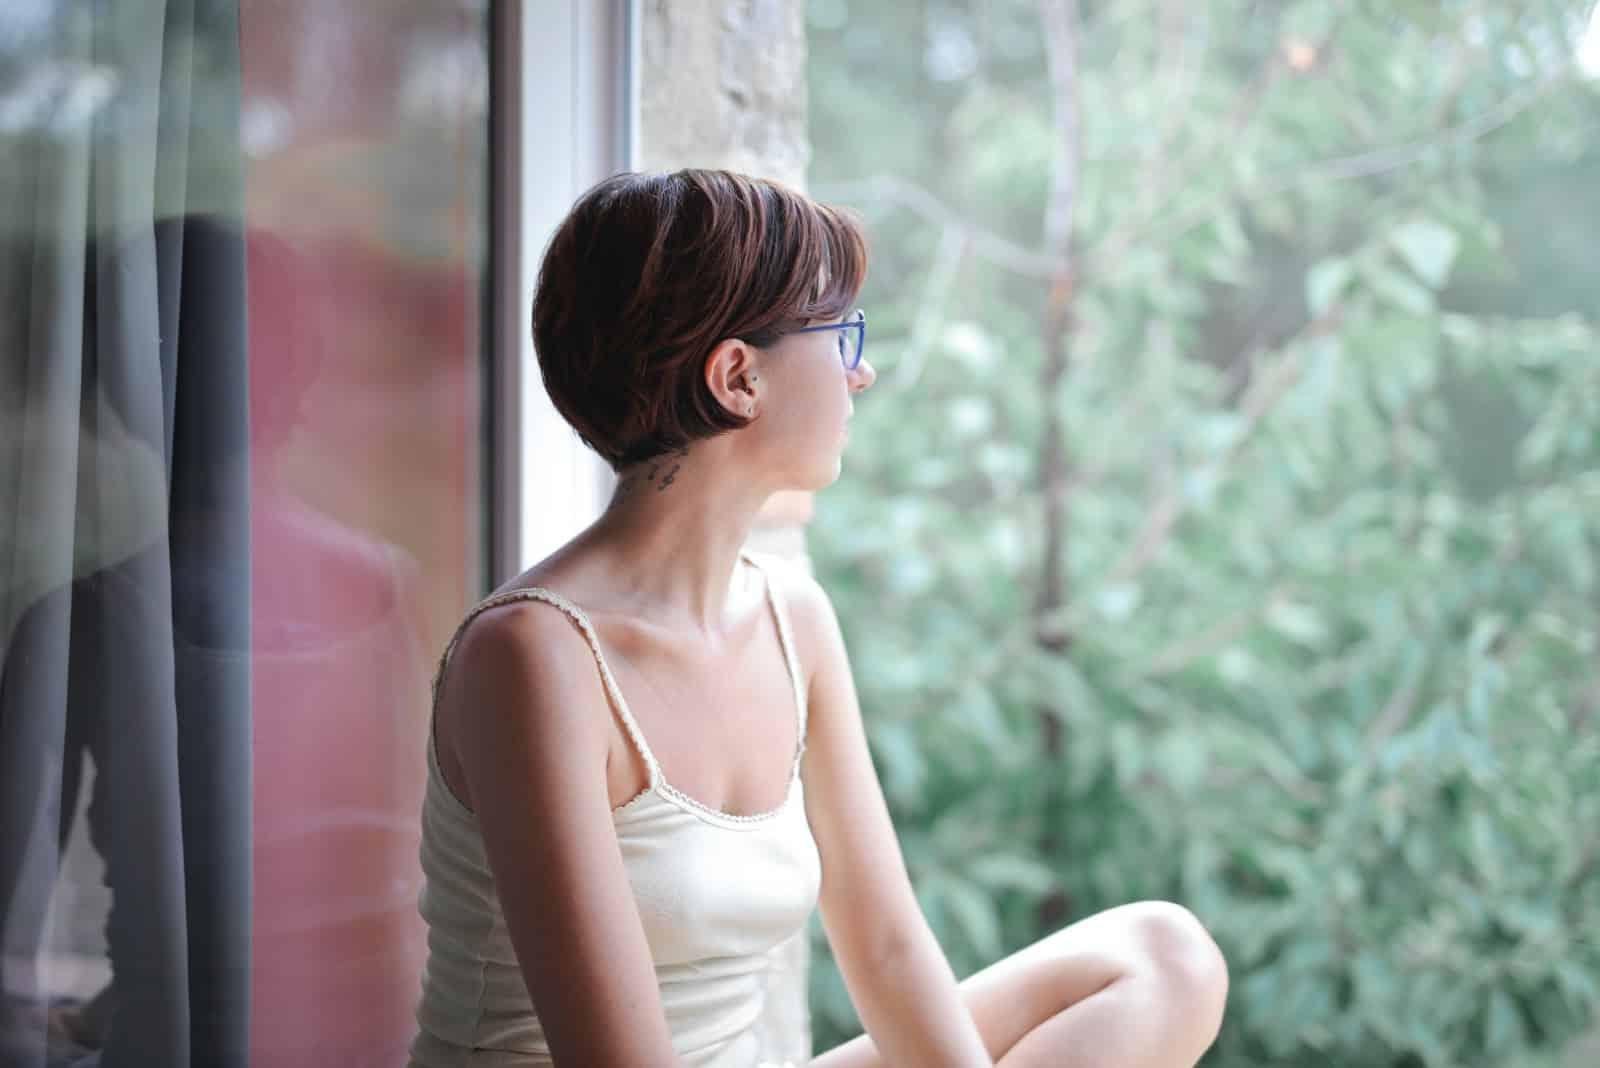 femme pensive en haut blanc regardant dehors